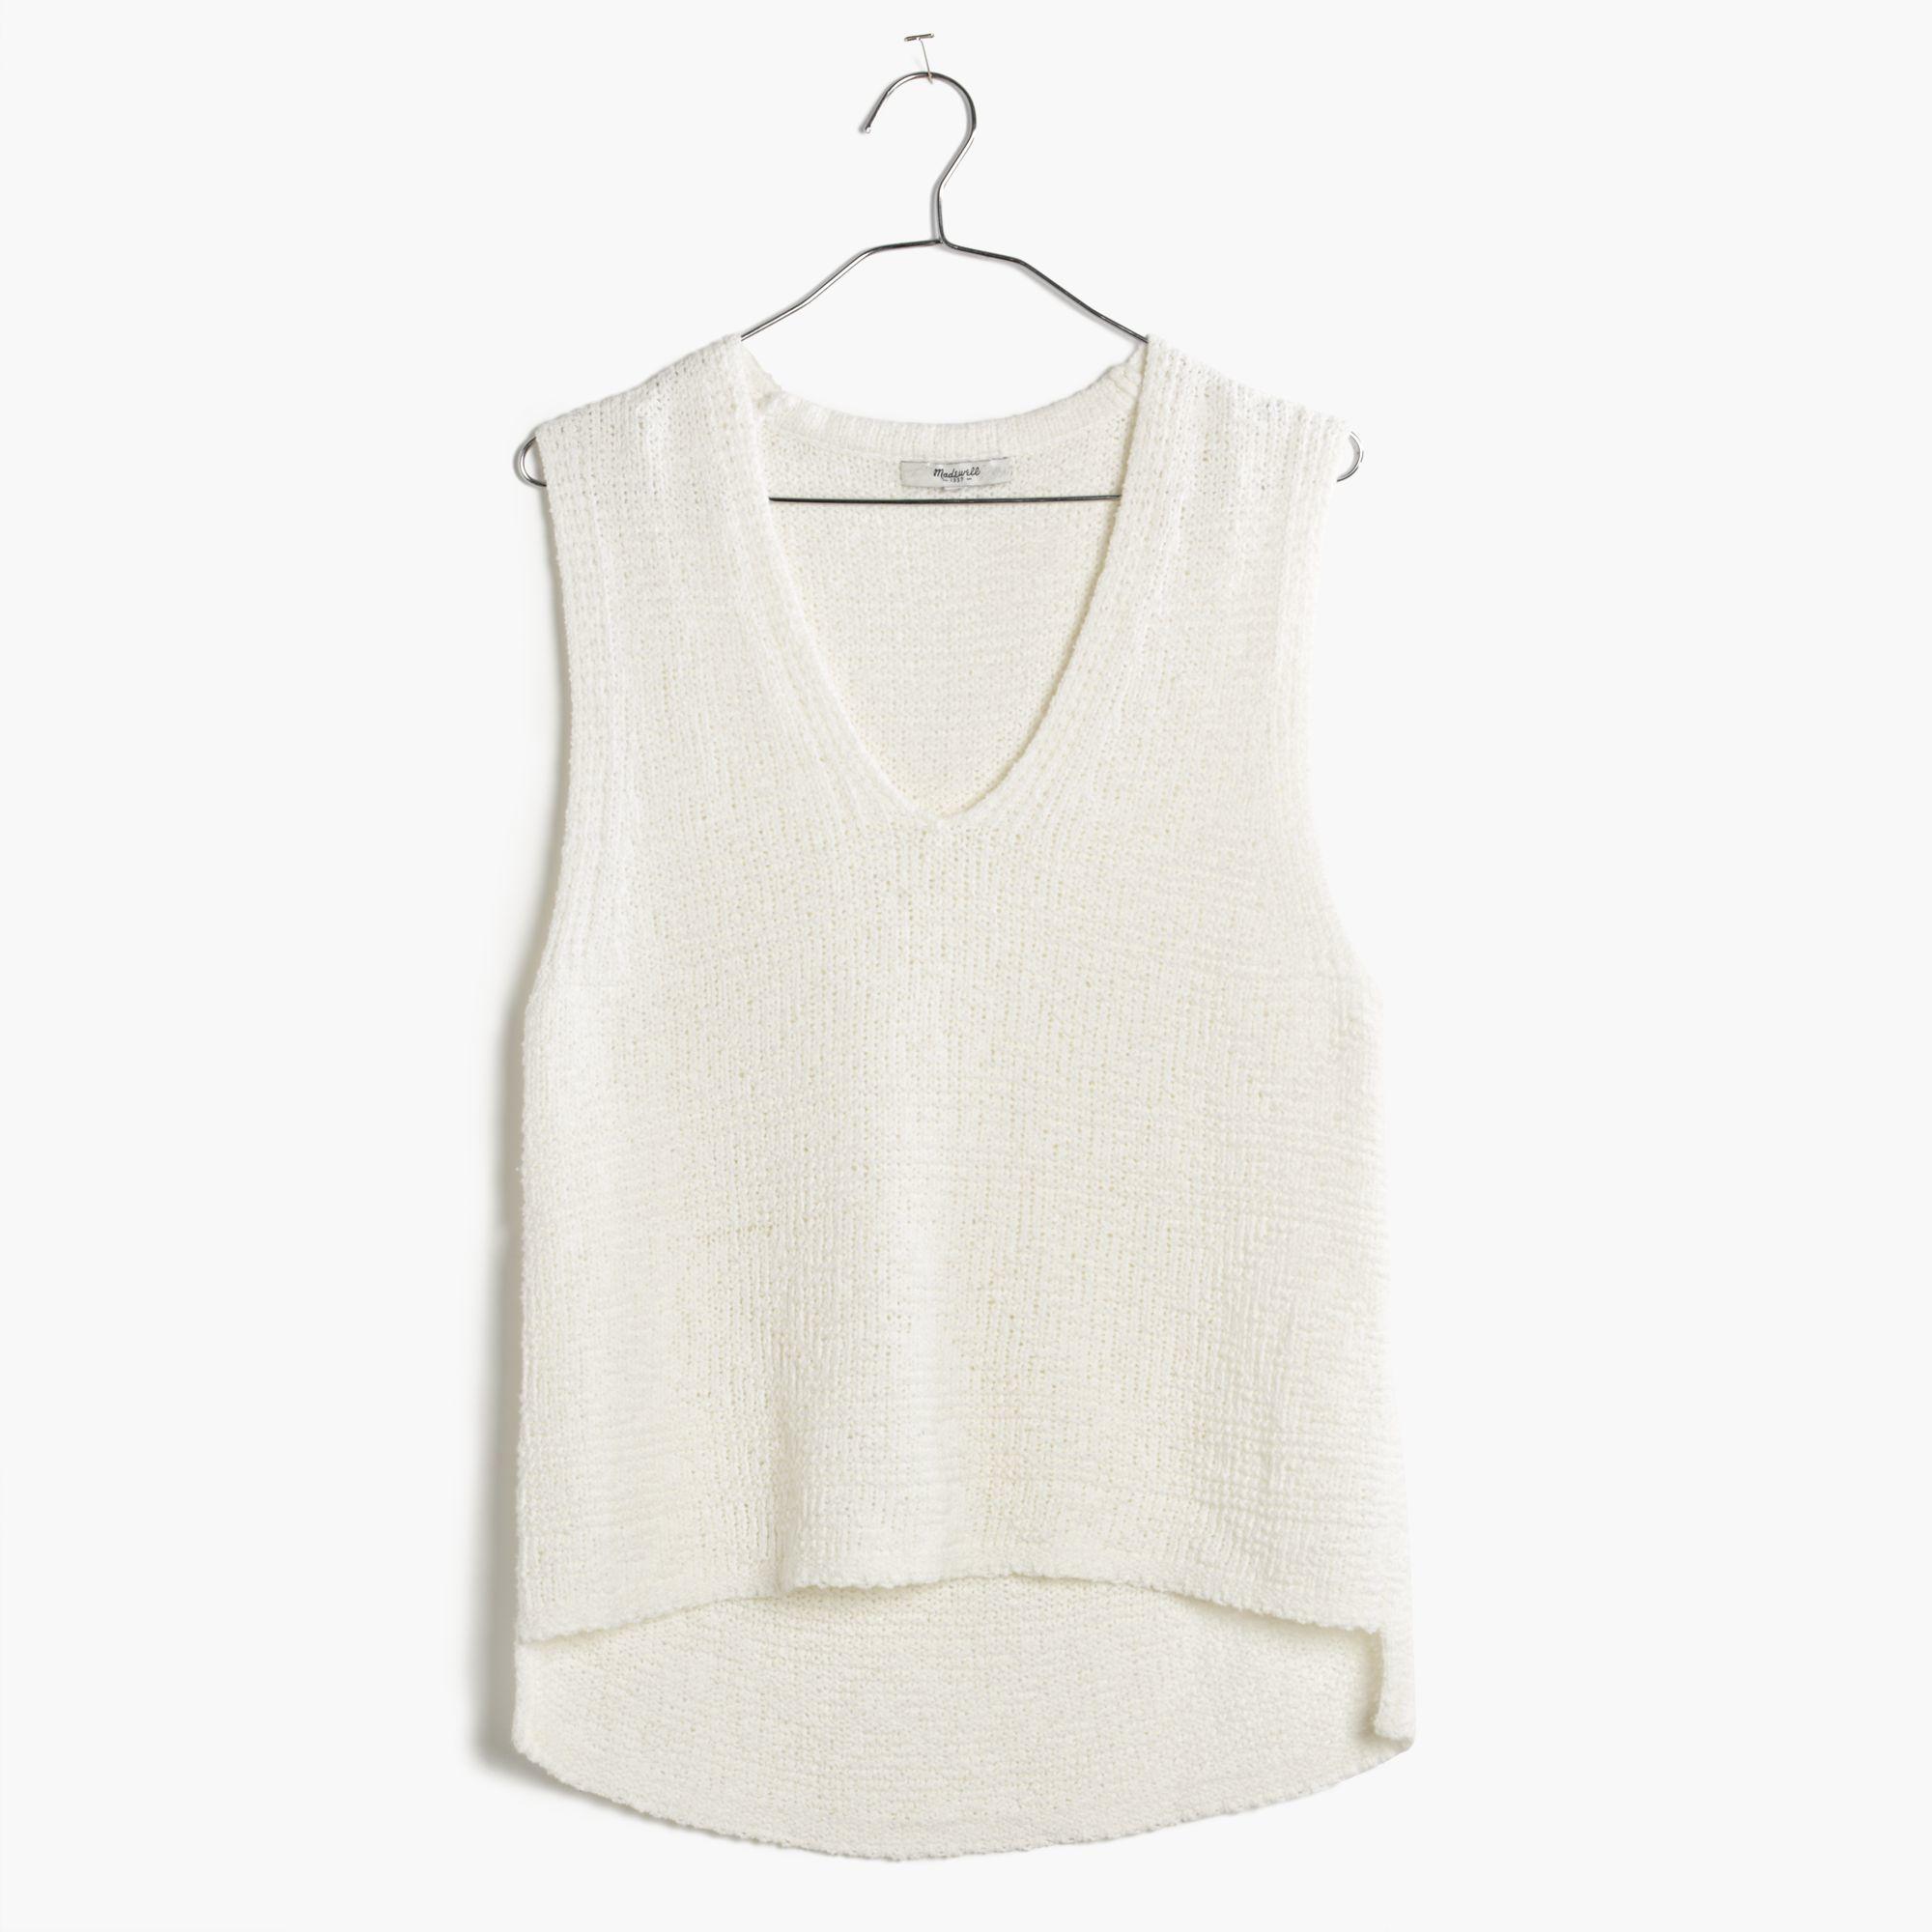 19cb77dbd170 Lyst - Madewell Stitchweave Sweater Tank in White